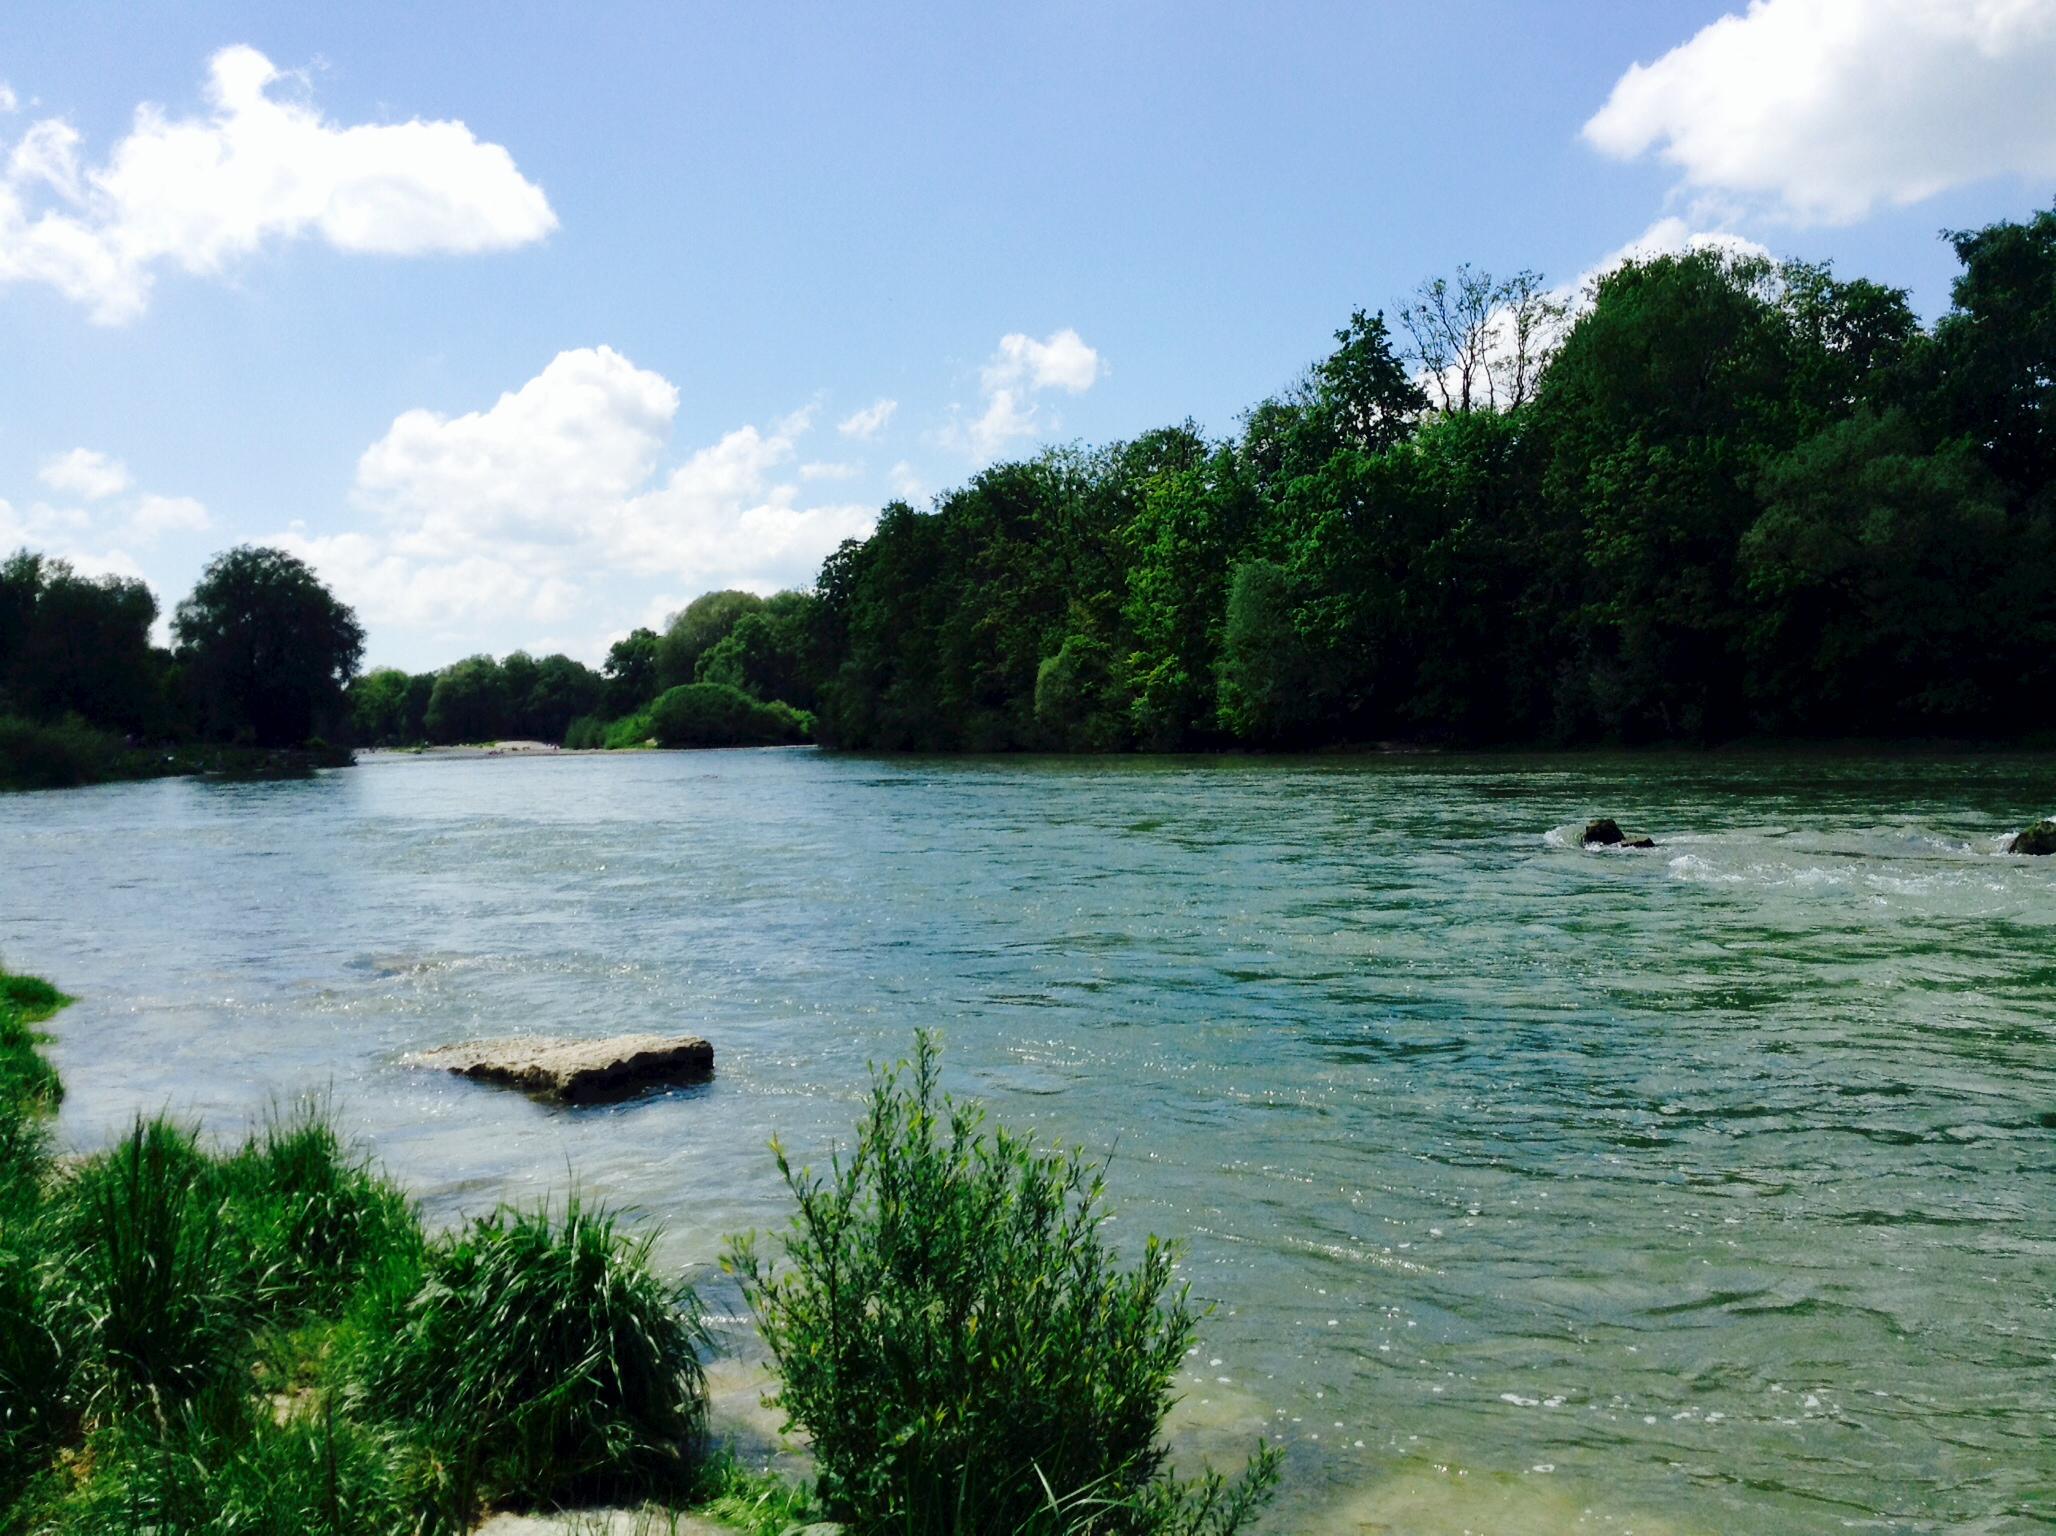 Beautiful scene at the river Isar